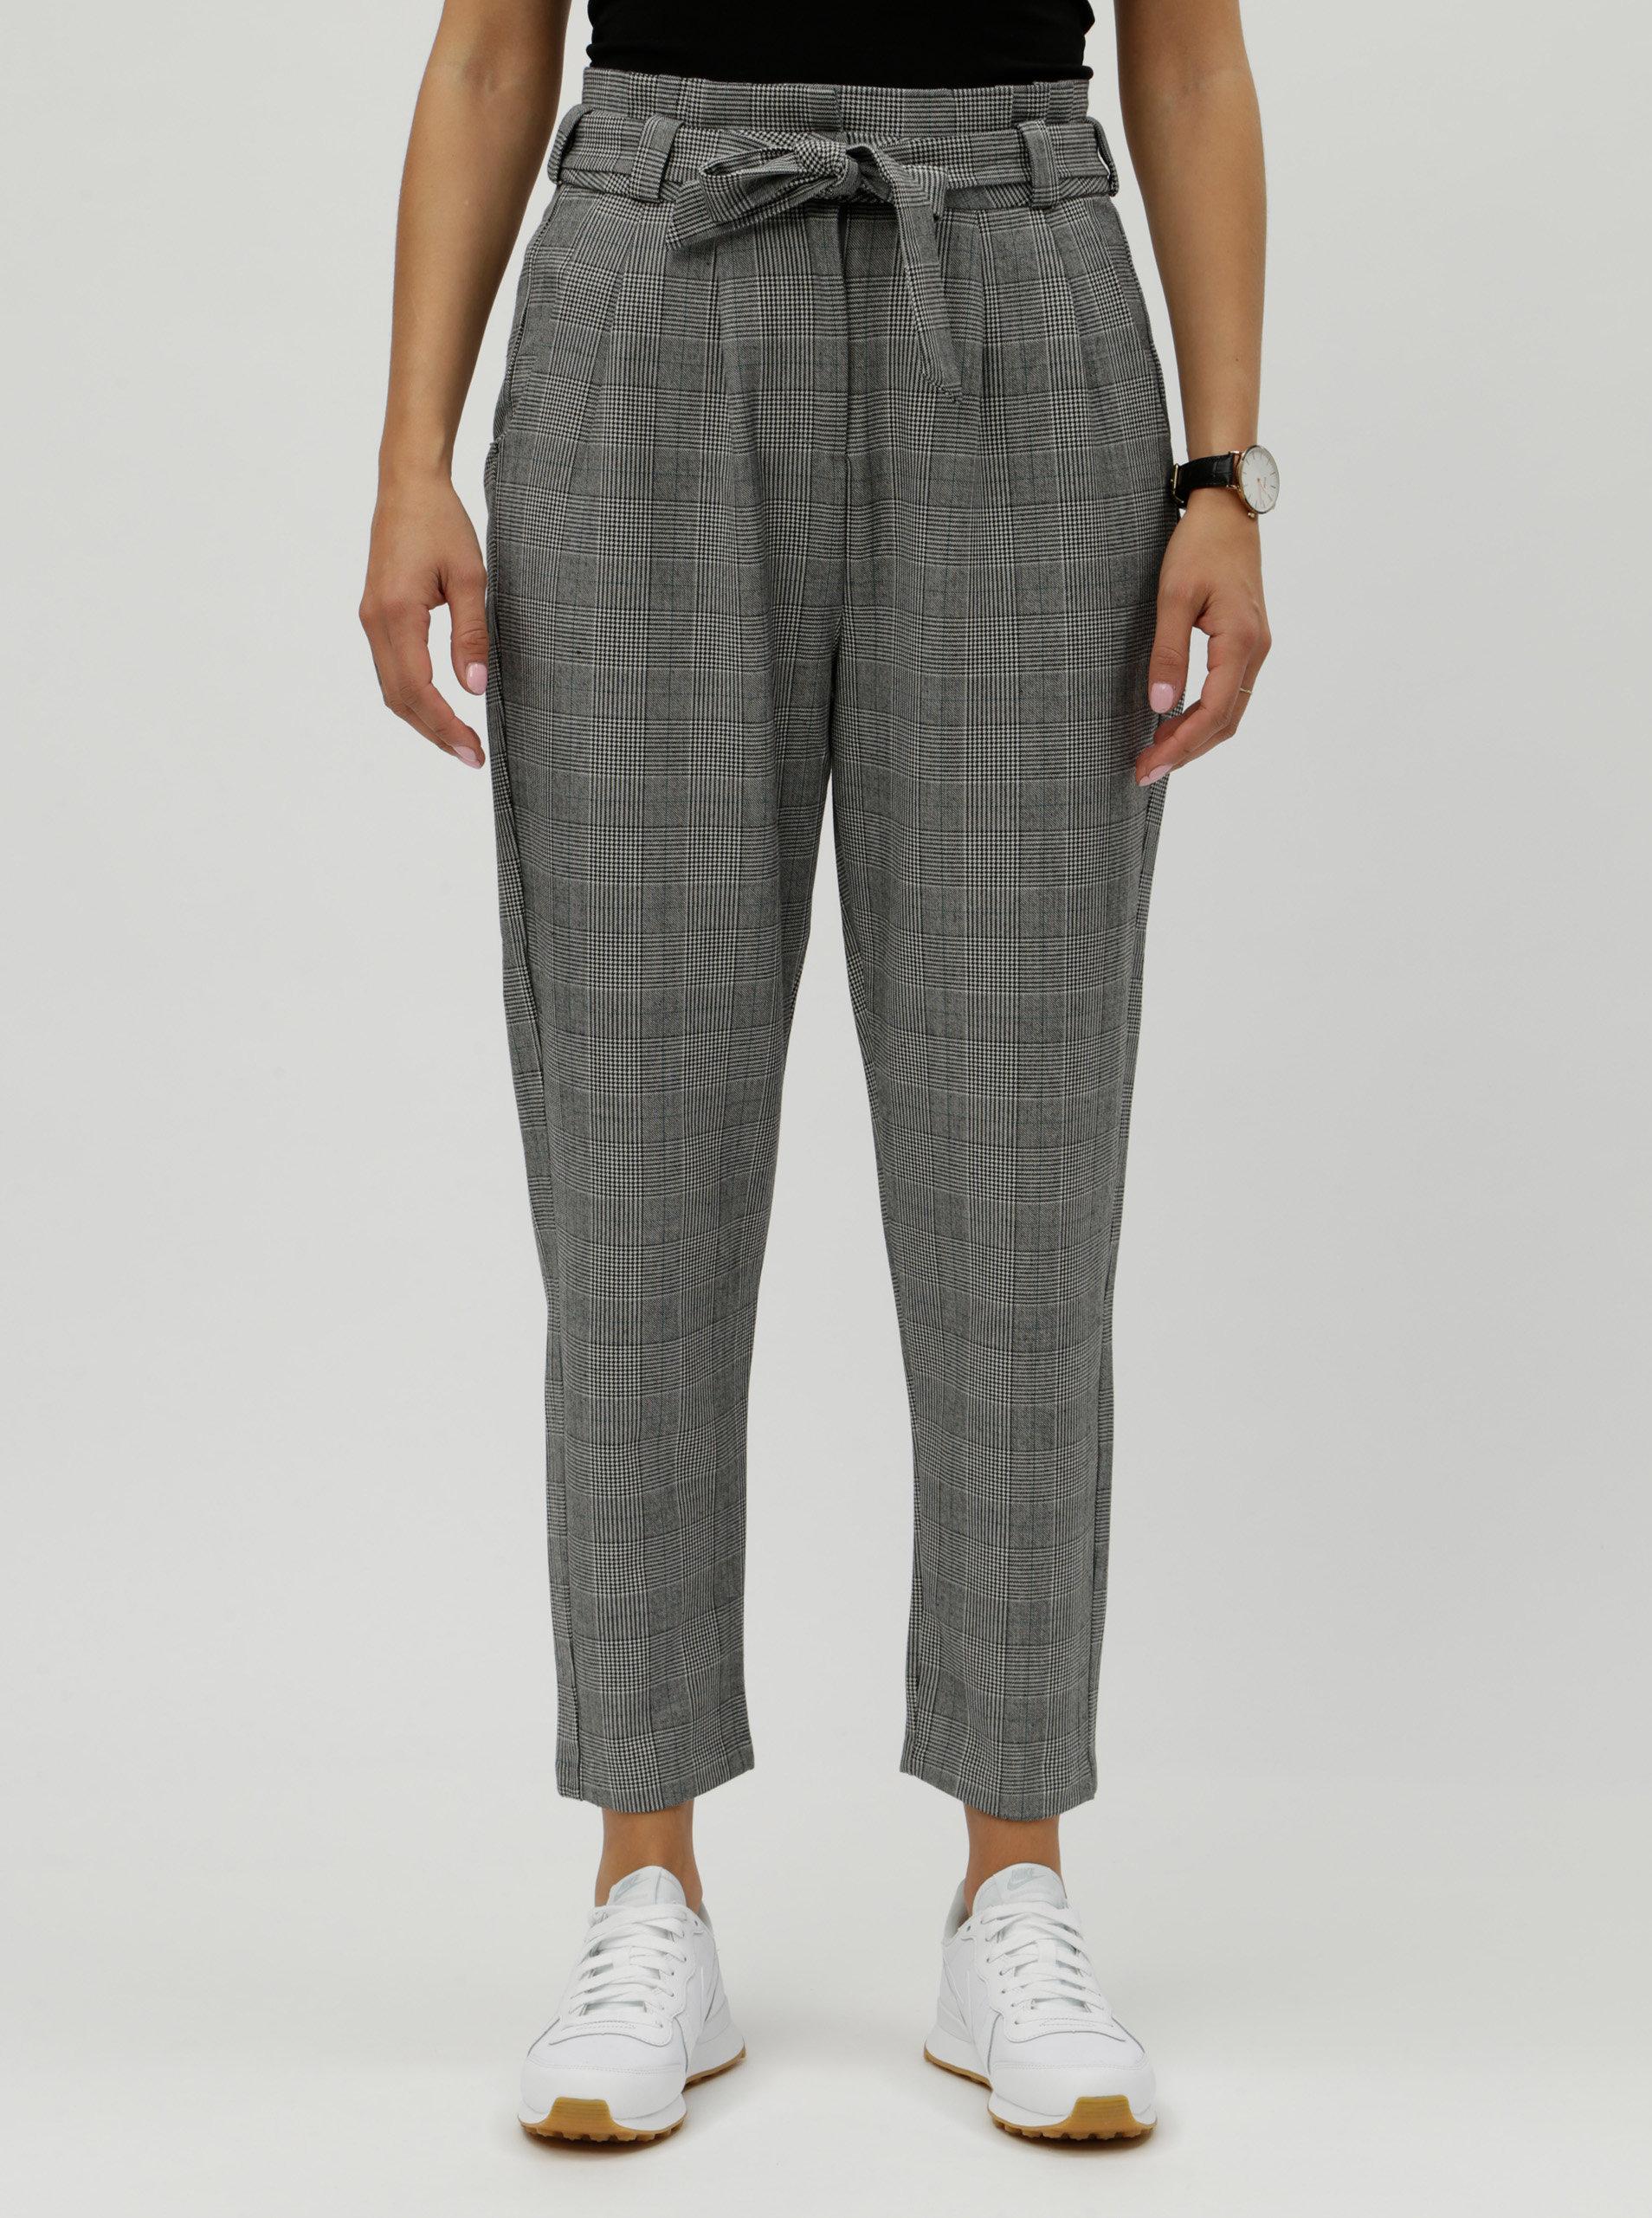 Šedé kostkované zkrácené kalhoty s vysokým pasem VERO MODA ... f0fbfea265